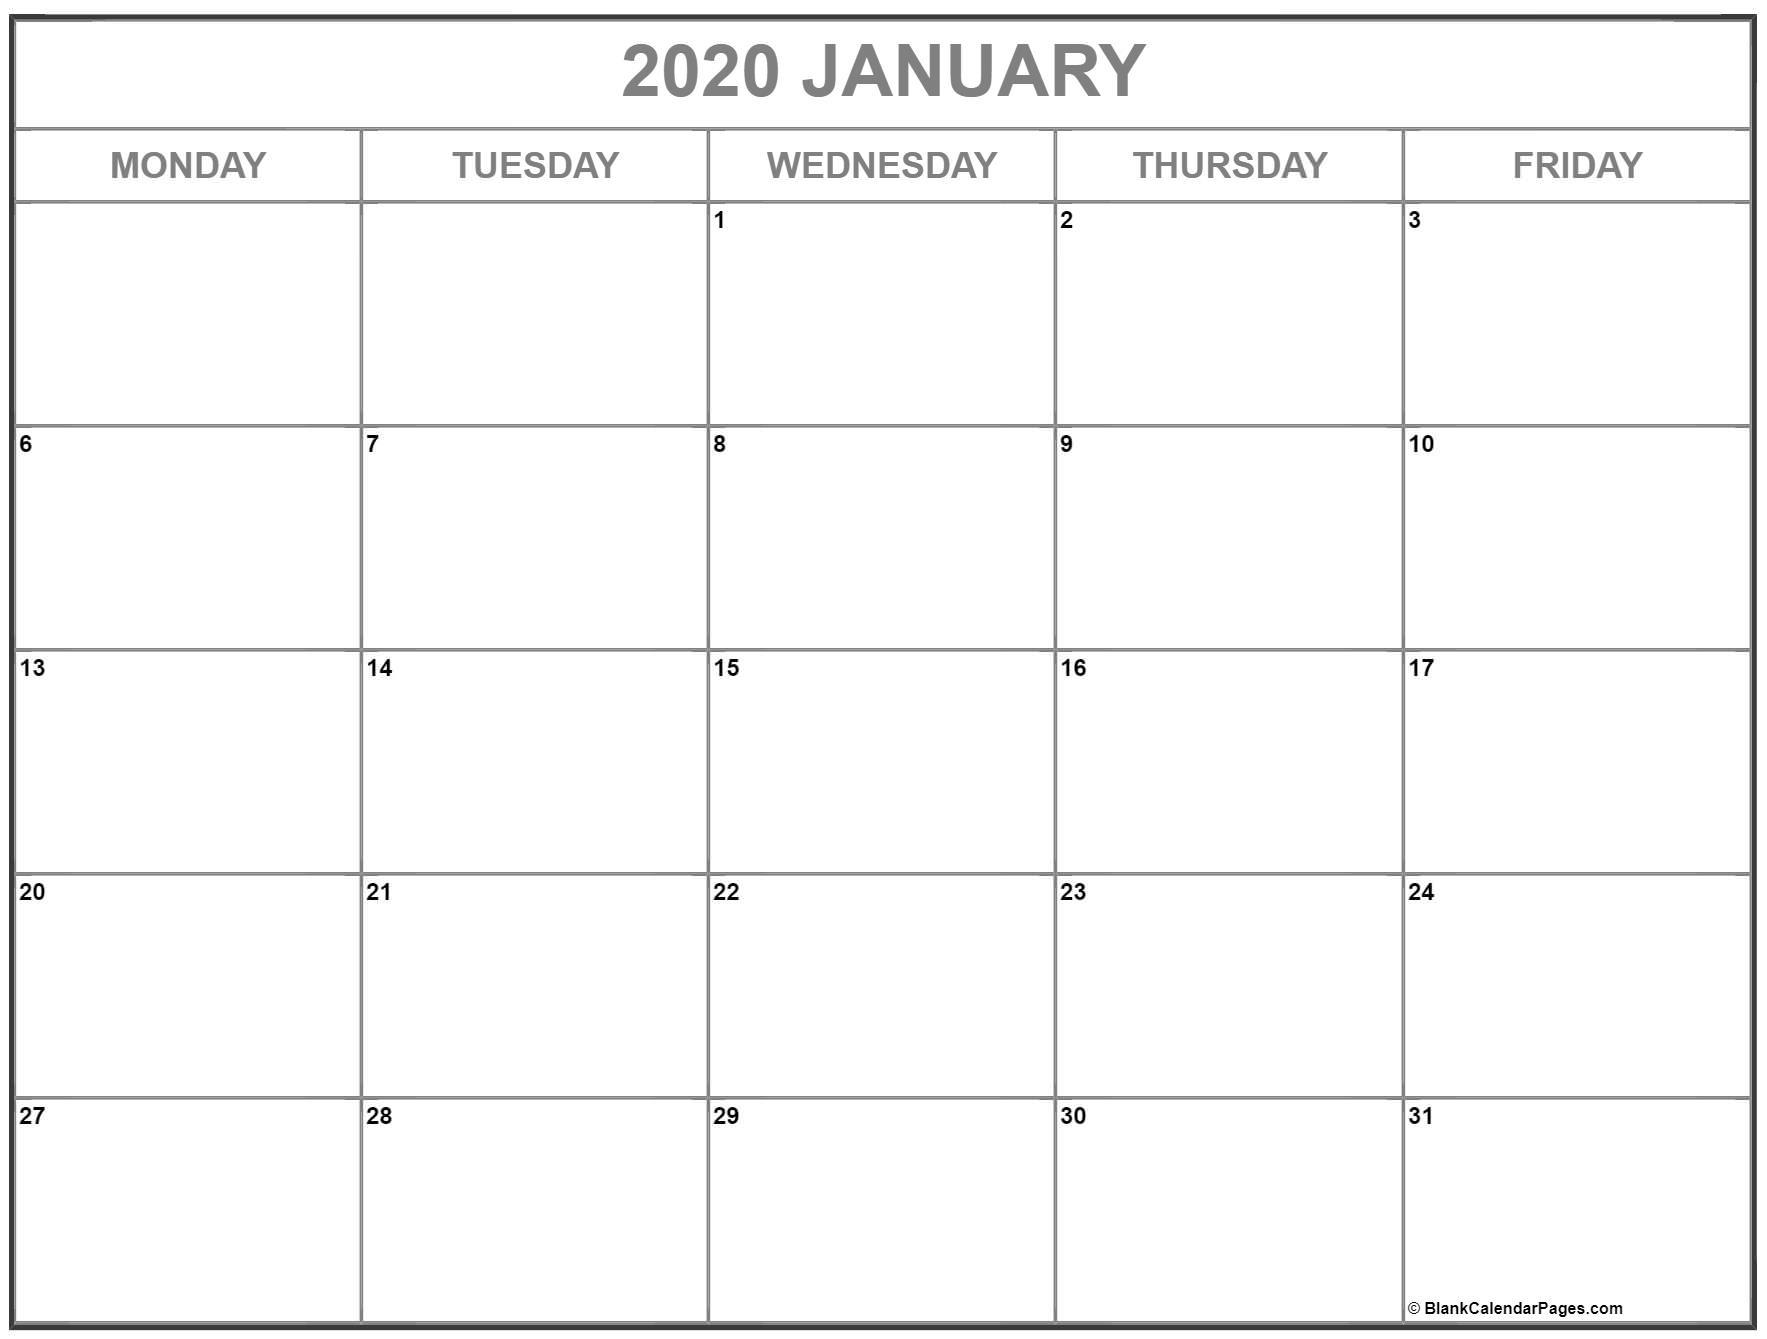 January 2020 Monday Calendar | Monday To Sunday intended for Monday Through Friday Calendar Template